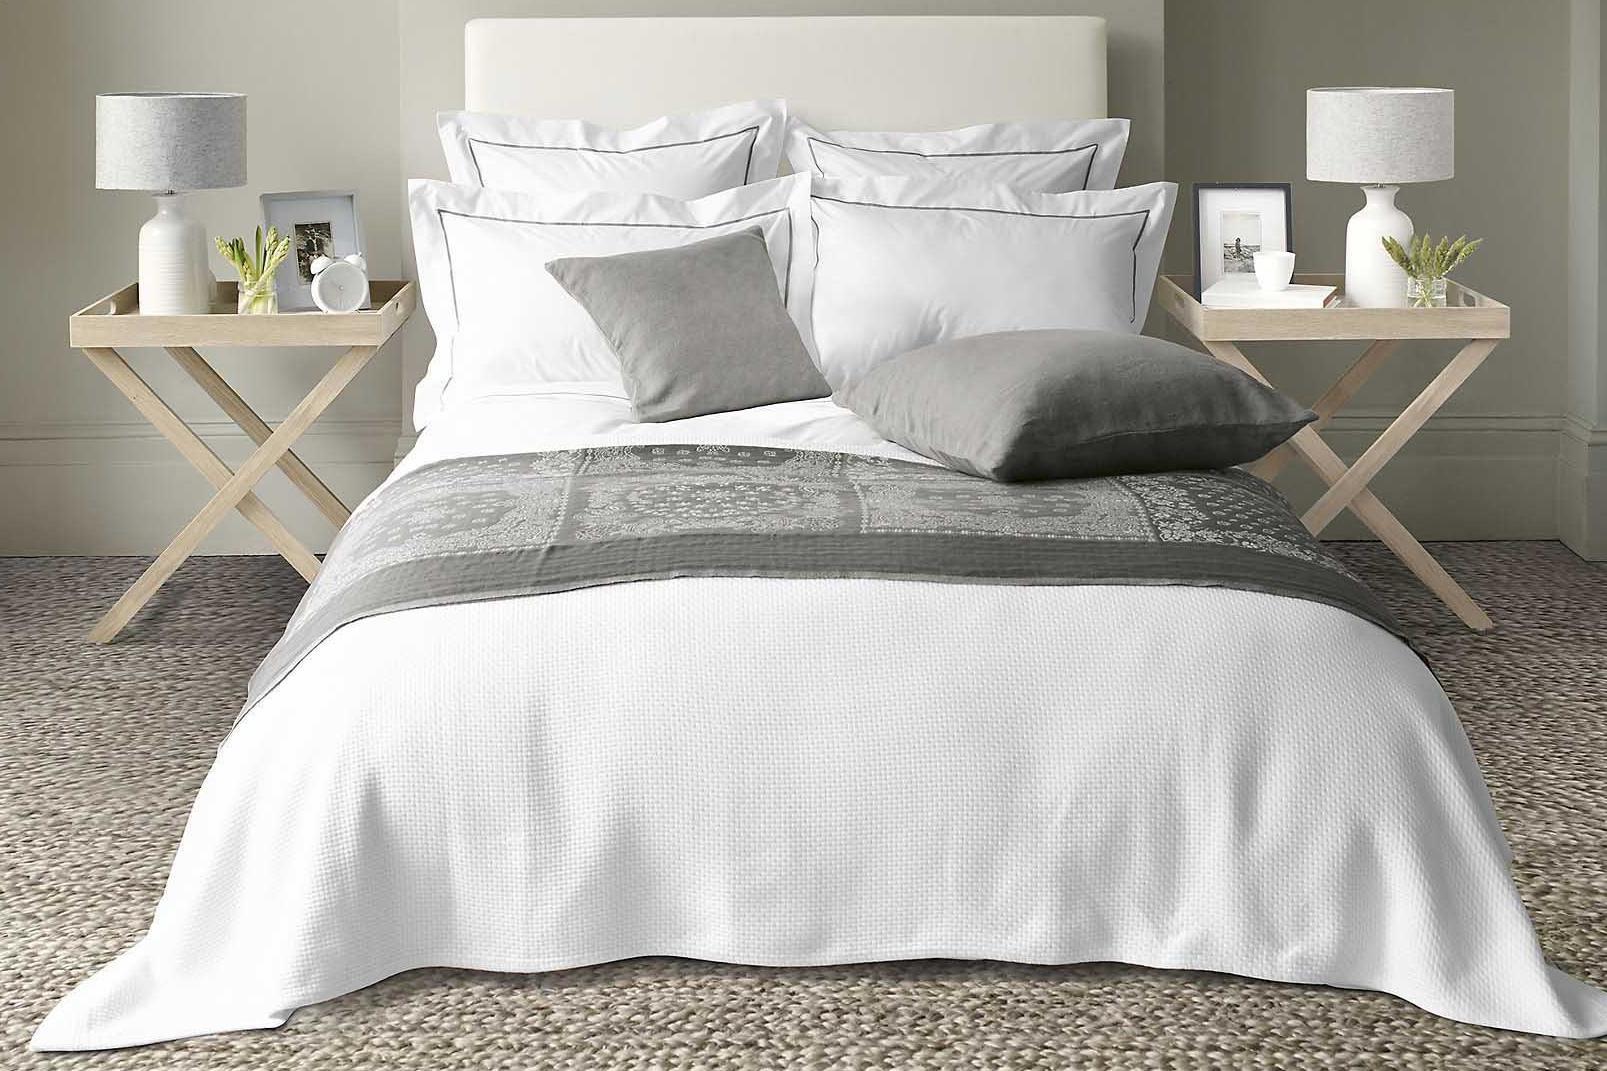 9 Best Bedding Sets The Independent